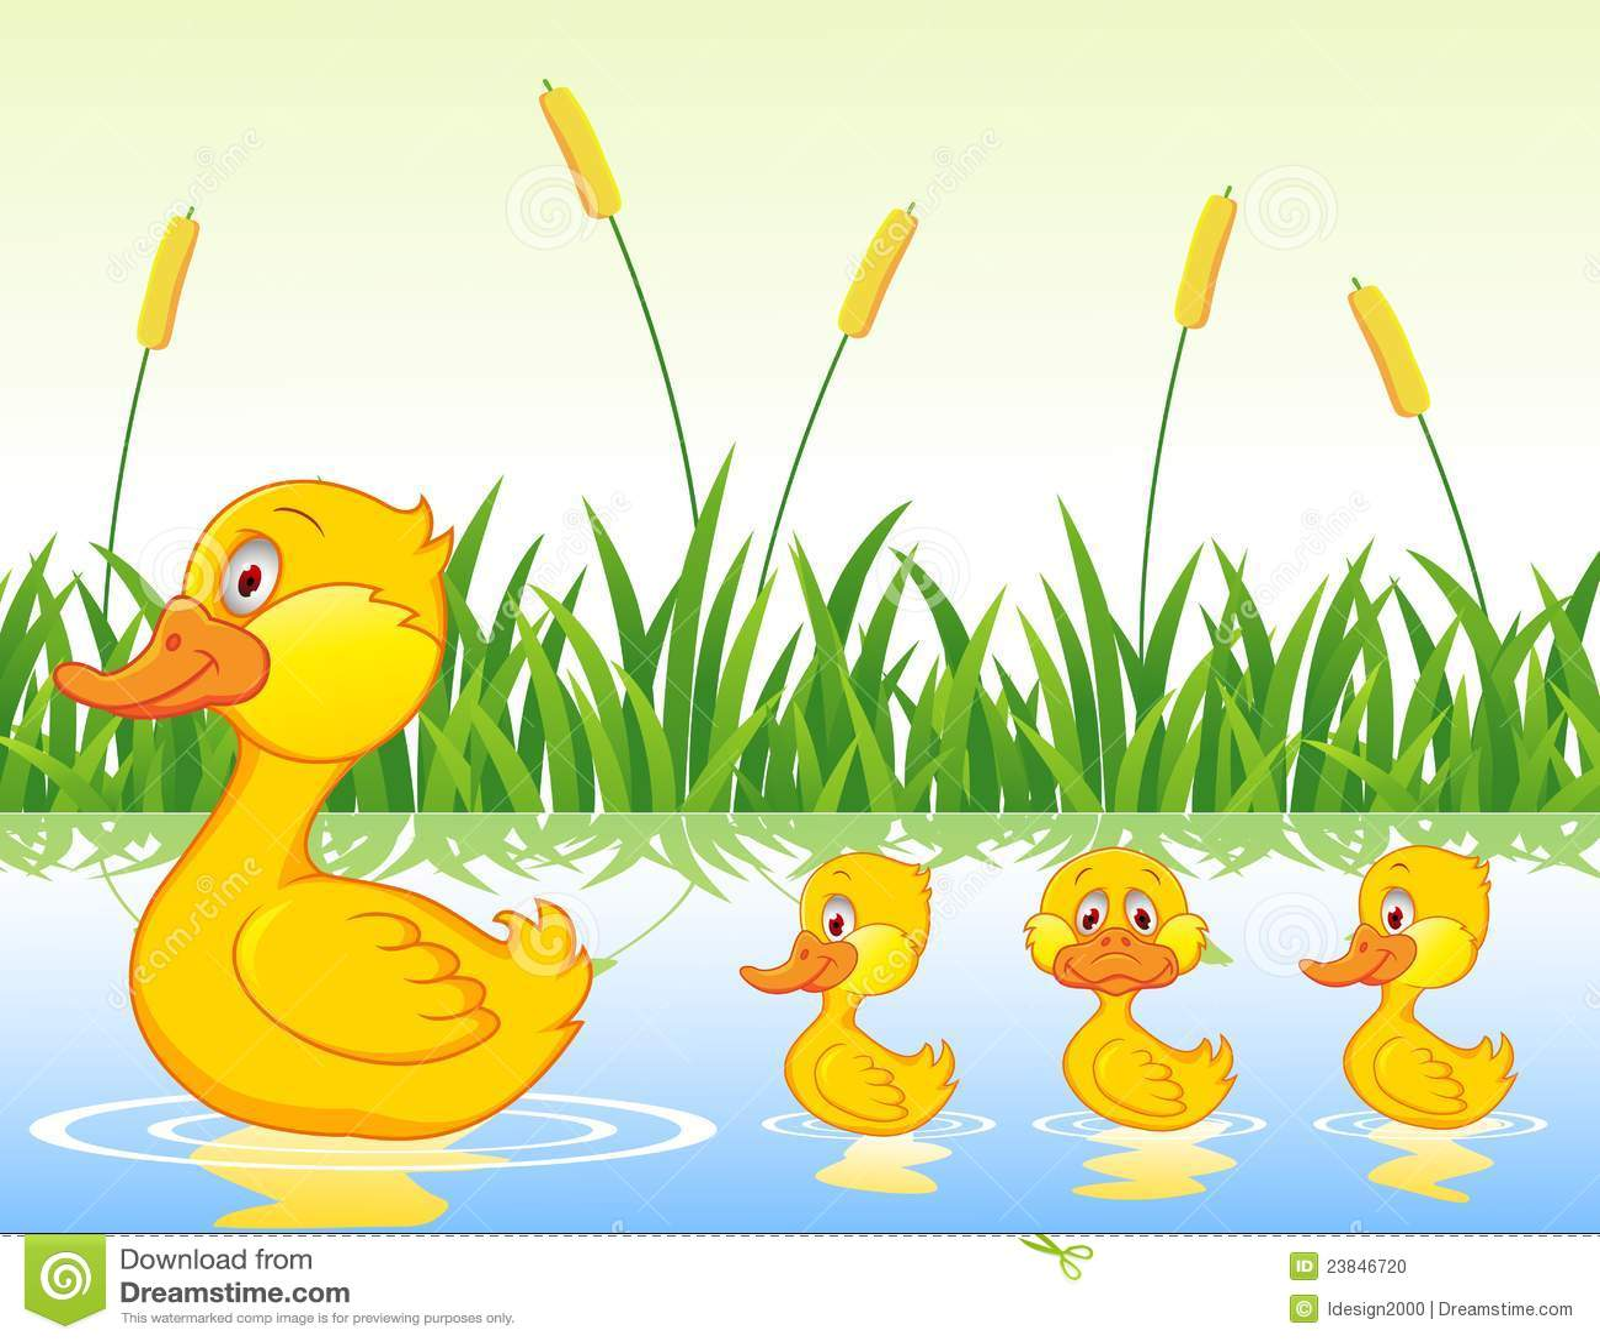 Duck family cartoon stock illustration. Image of bright ...